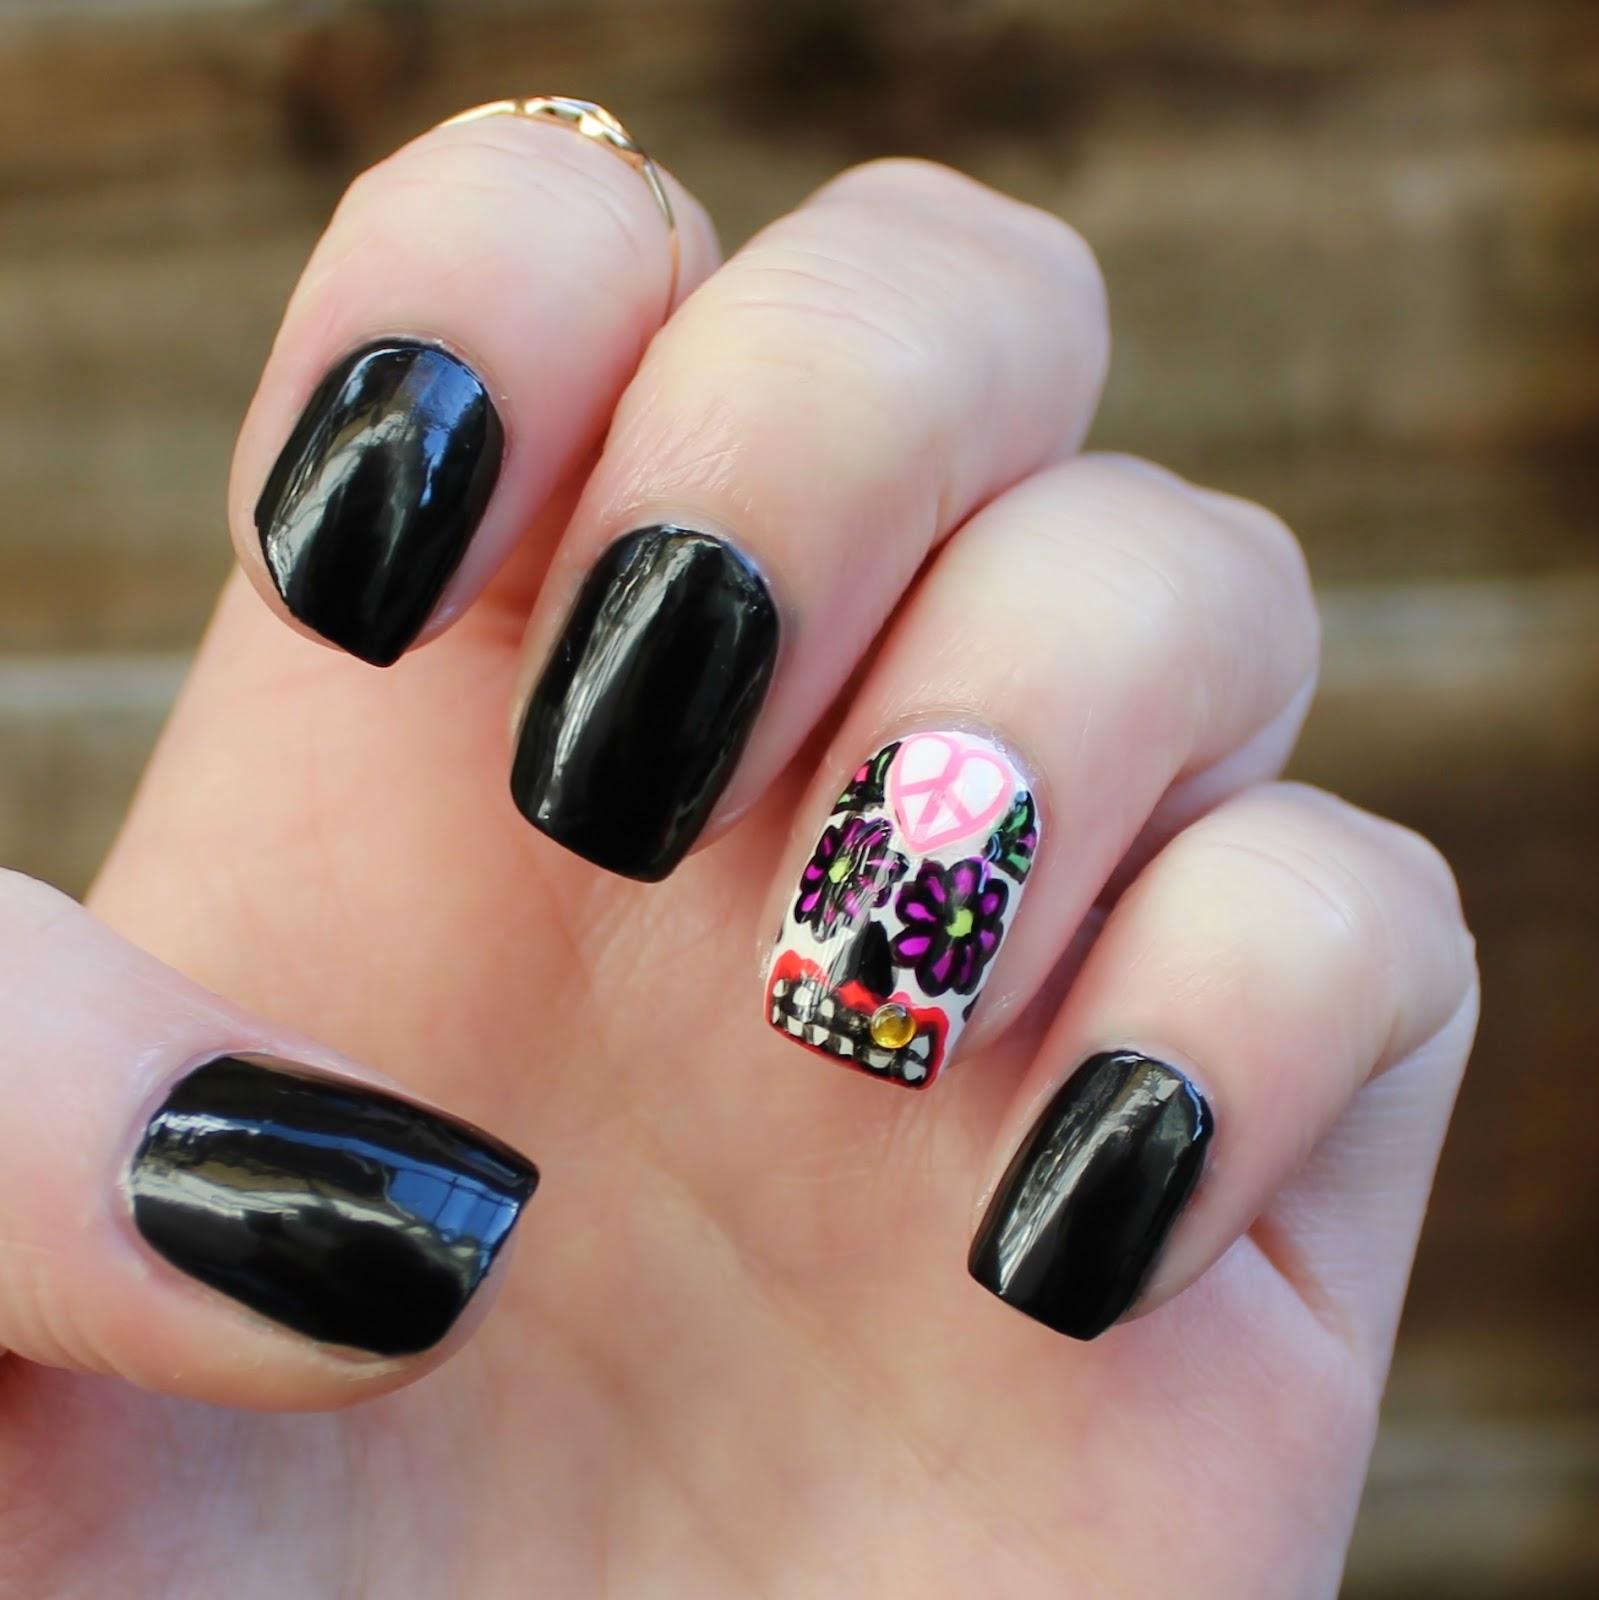 Dahlia Nails: Calavera Catrina